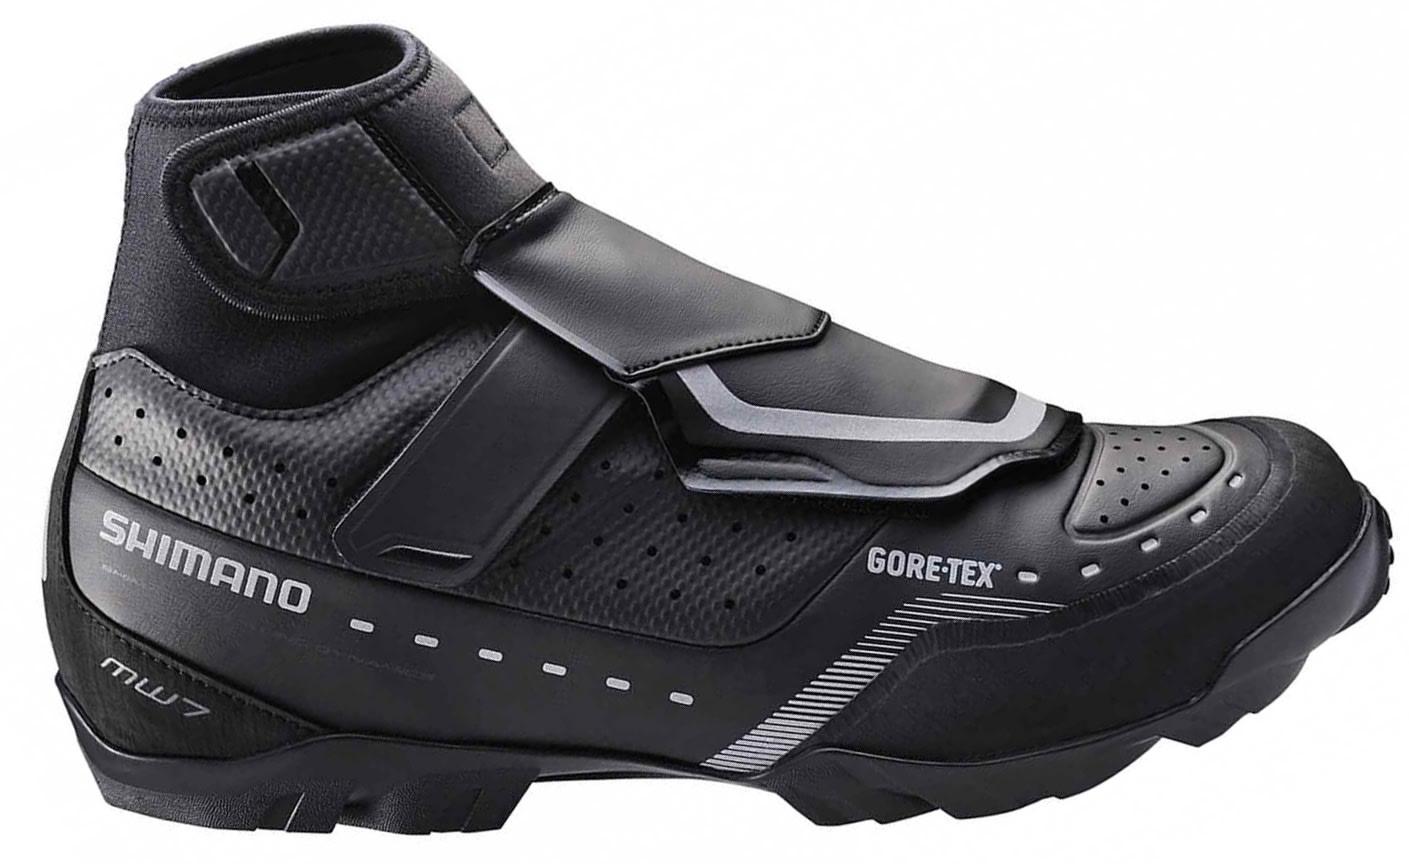 556fe9c4bfe Shimano SH-MW7 Gore-Tex Bike Shoes - thumbnail 1